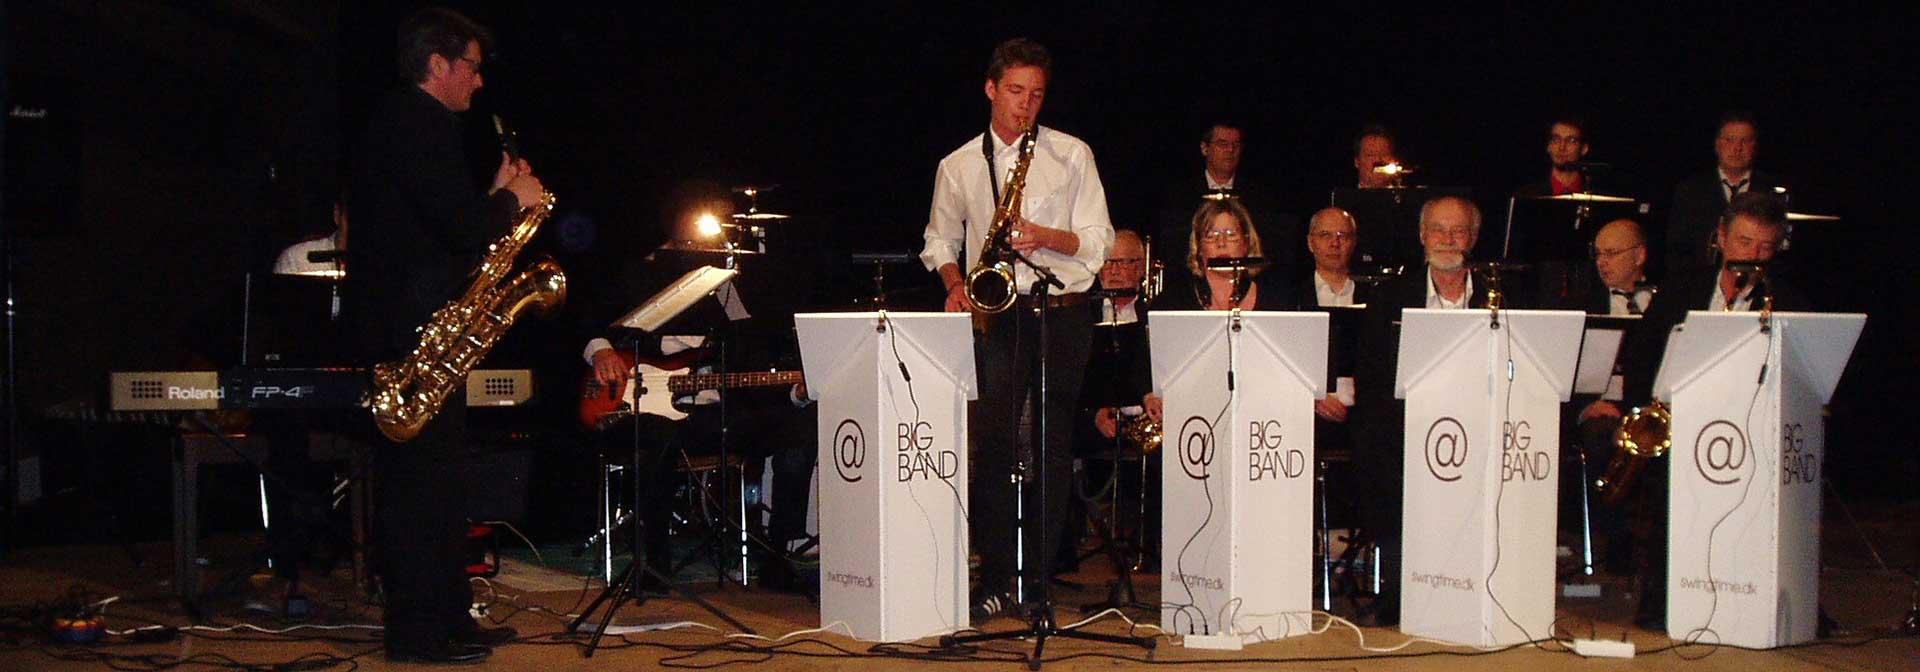 Nyborg Bigband koncert